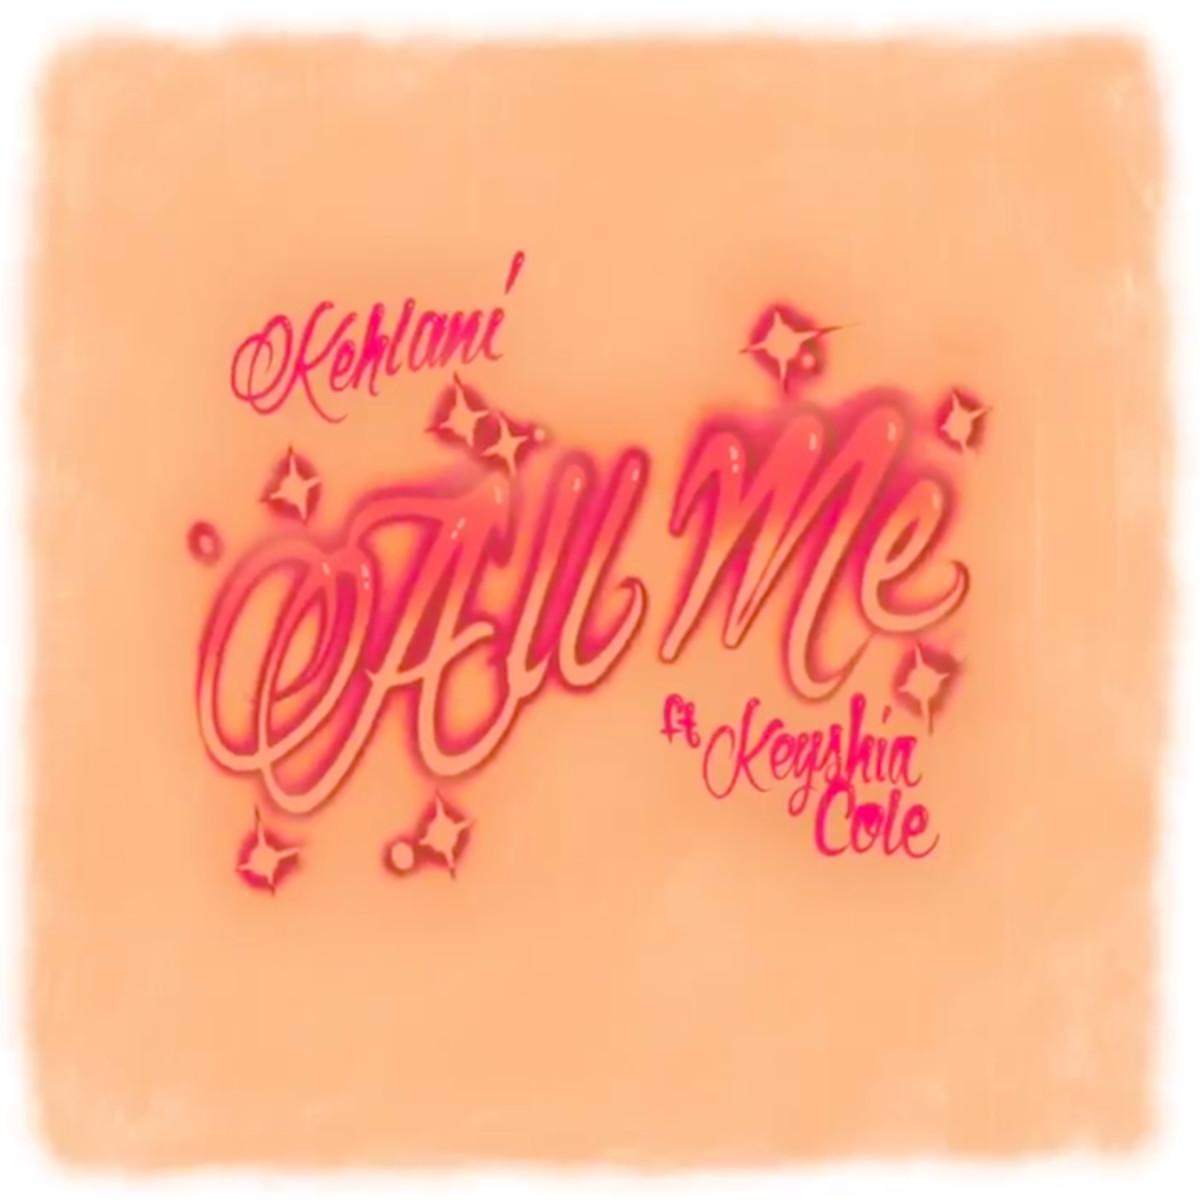 Kehlani first single